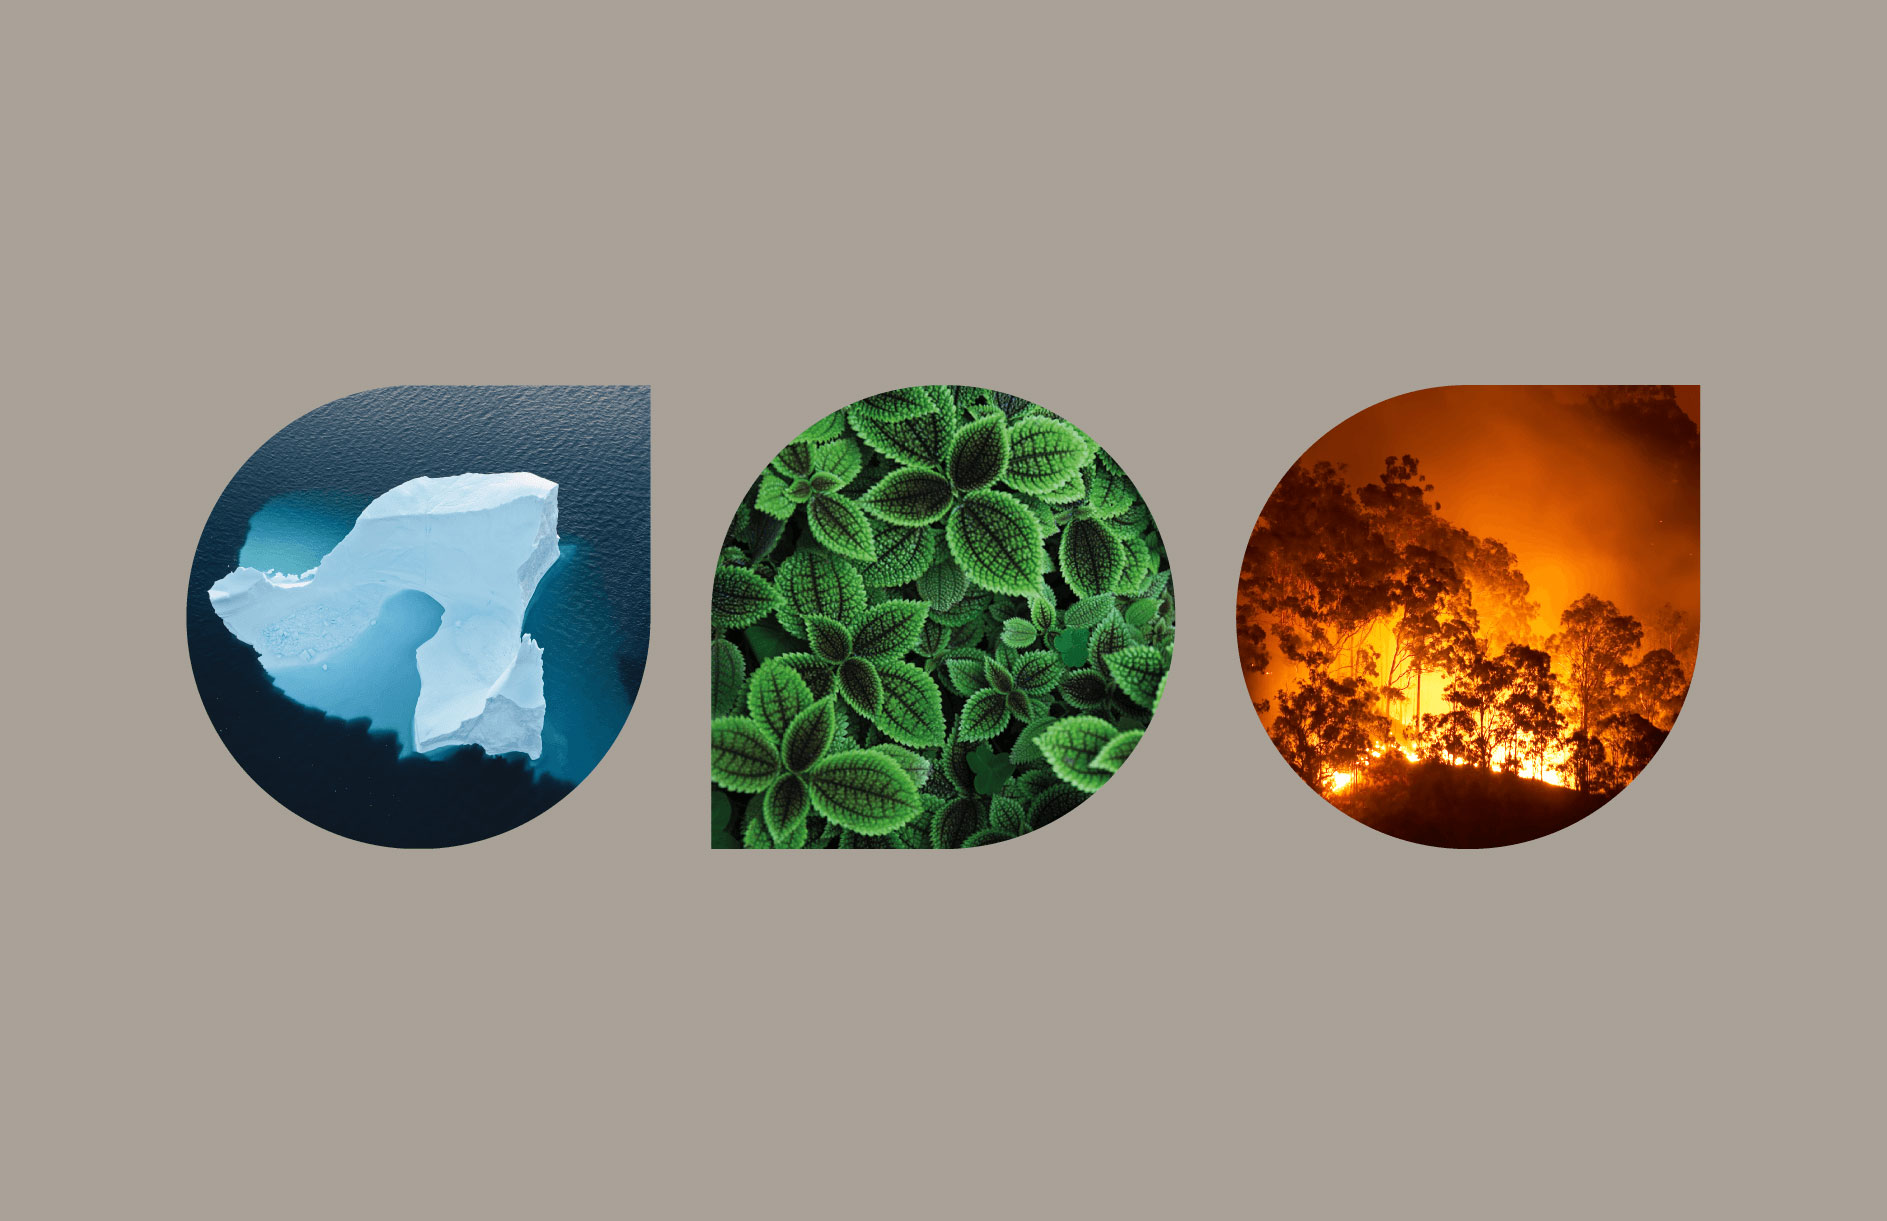 Linklaters / ESG visual language